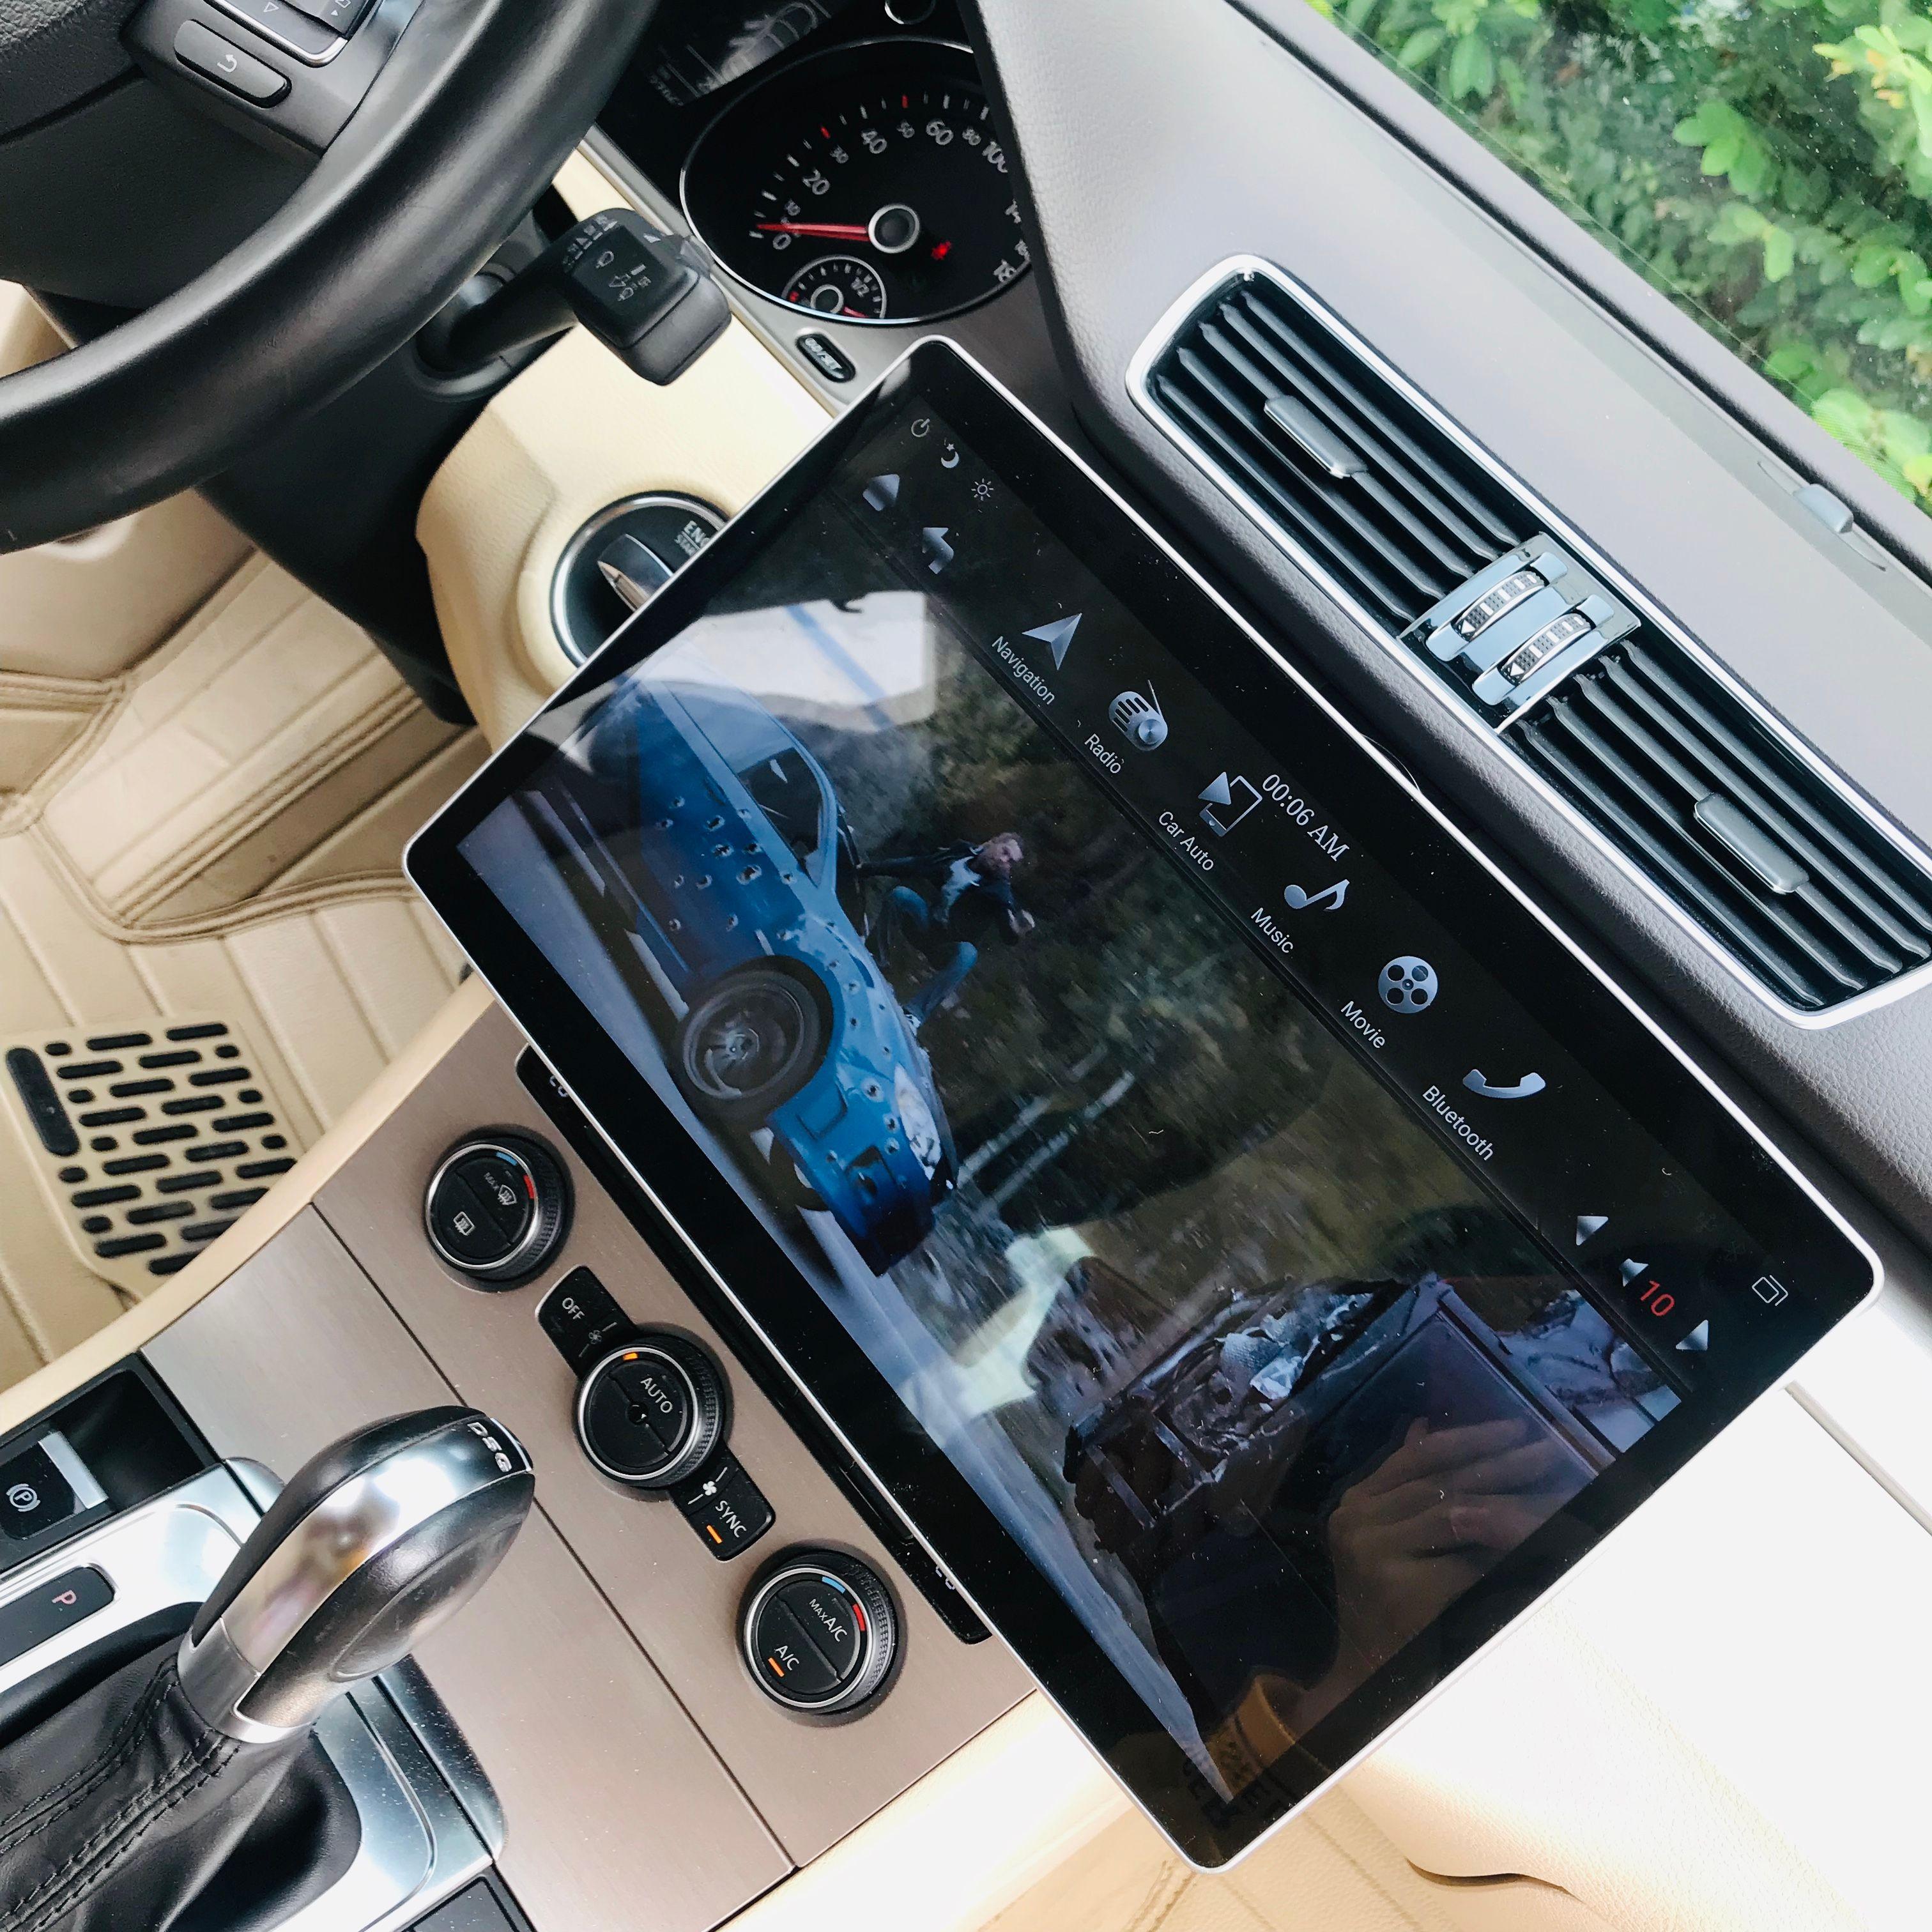 8 Core 64 GB rom Android 9.0 Navirider Auto radio GPS Navigation 9,7 ''Universal radio up down einstellen winkel bluetooth video-Player